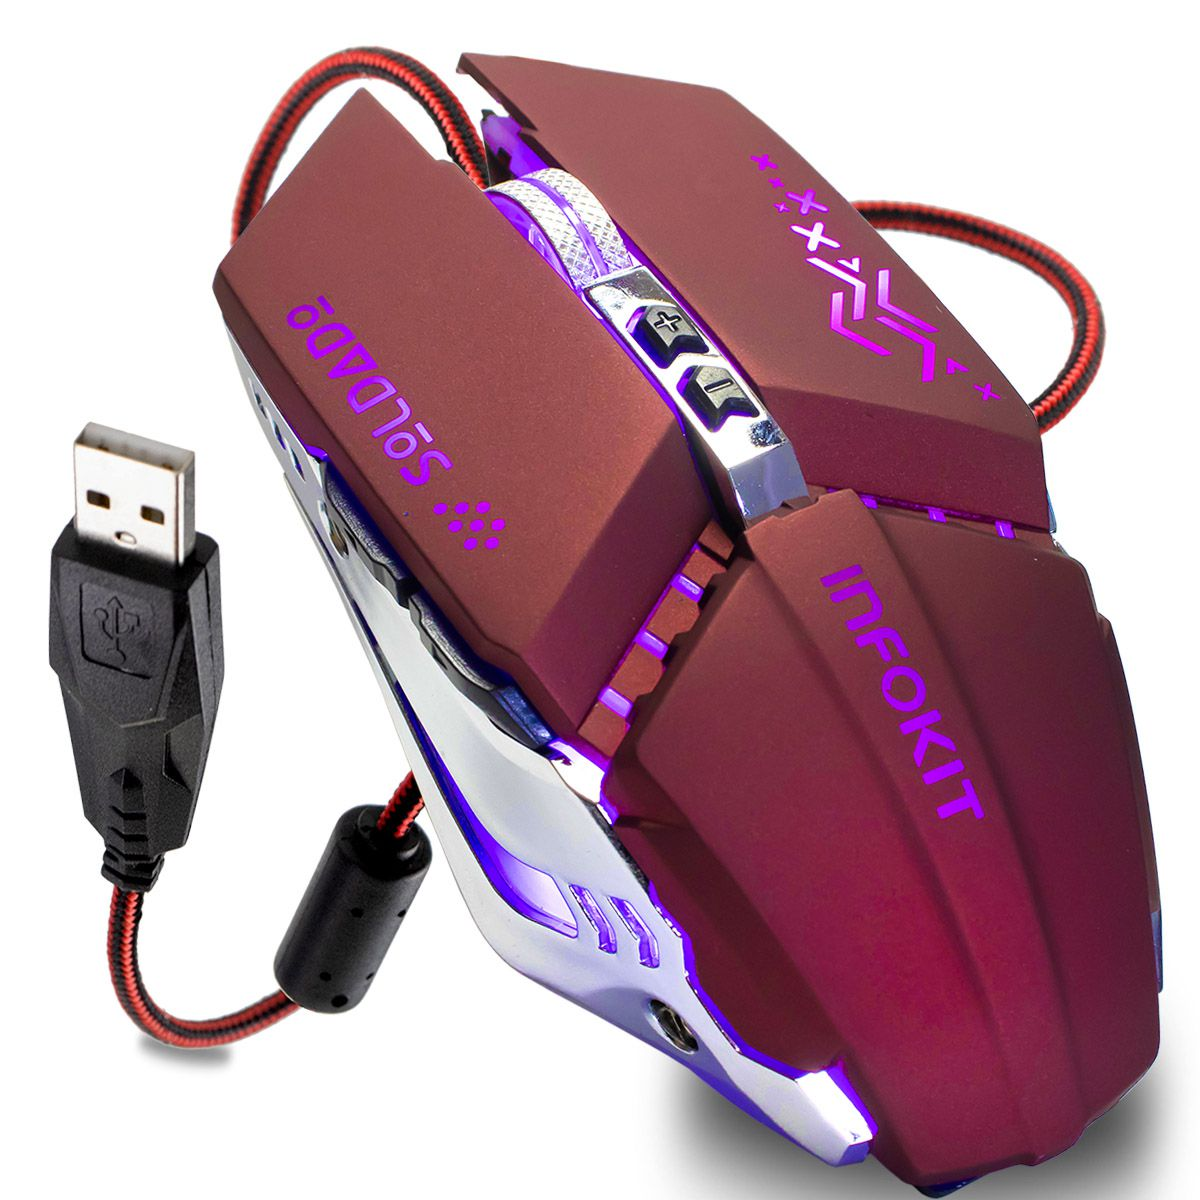 Mouse Gamer Usb com Iluminação Led Rgb Infokit GM-705